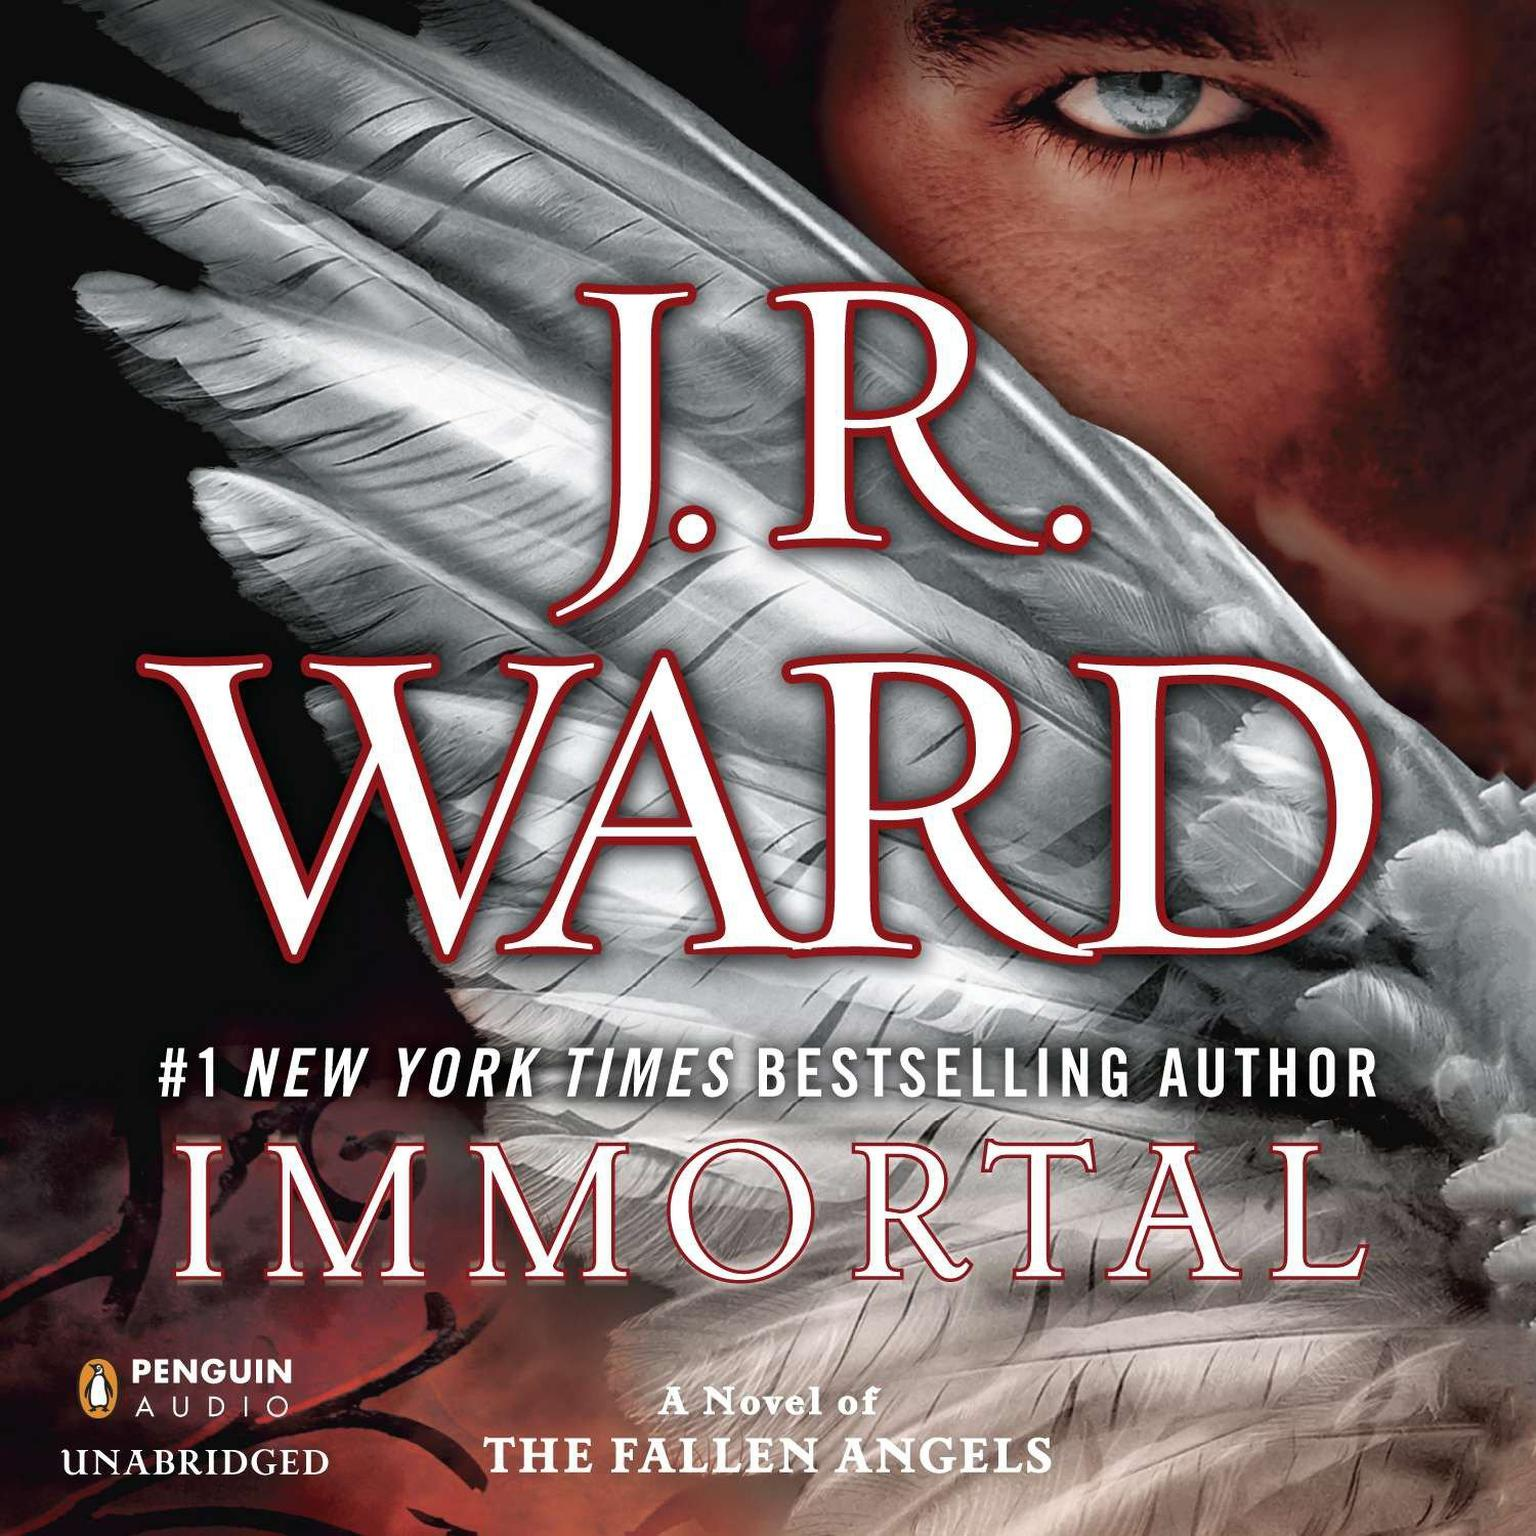 Immortal: A Novel of the Fallen Angels Audiobook, by J. R. Ward